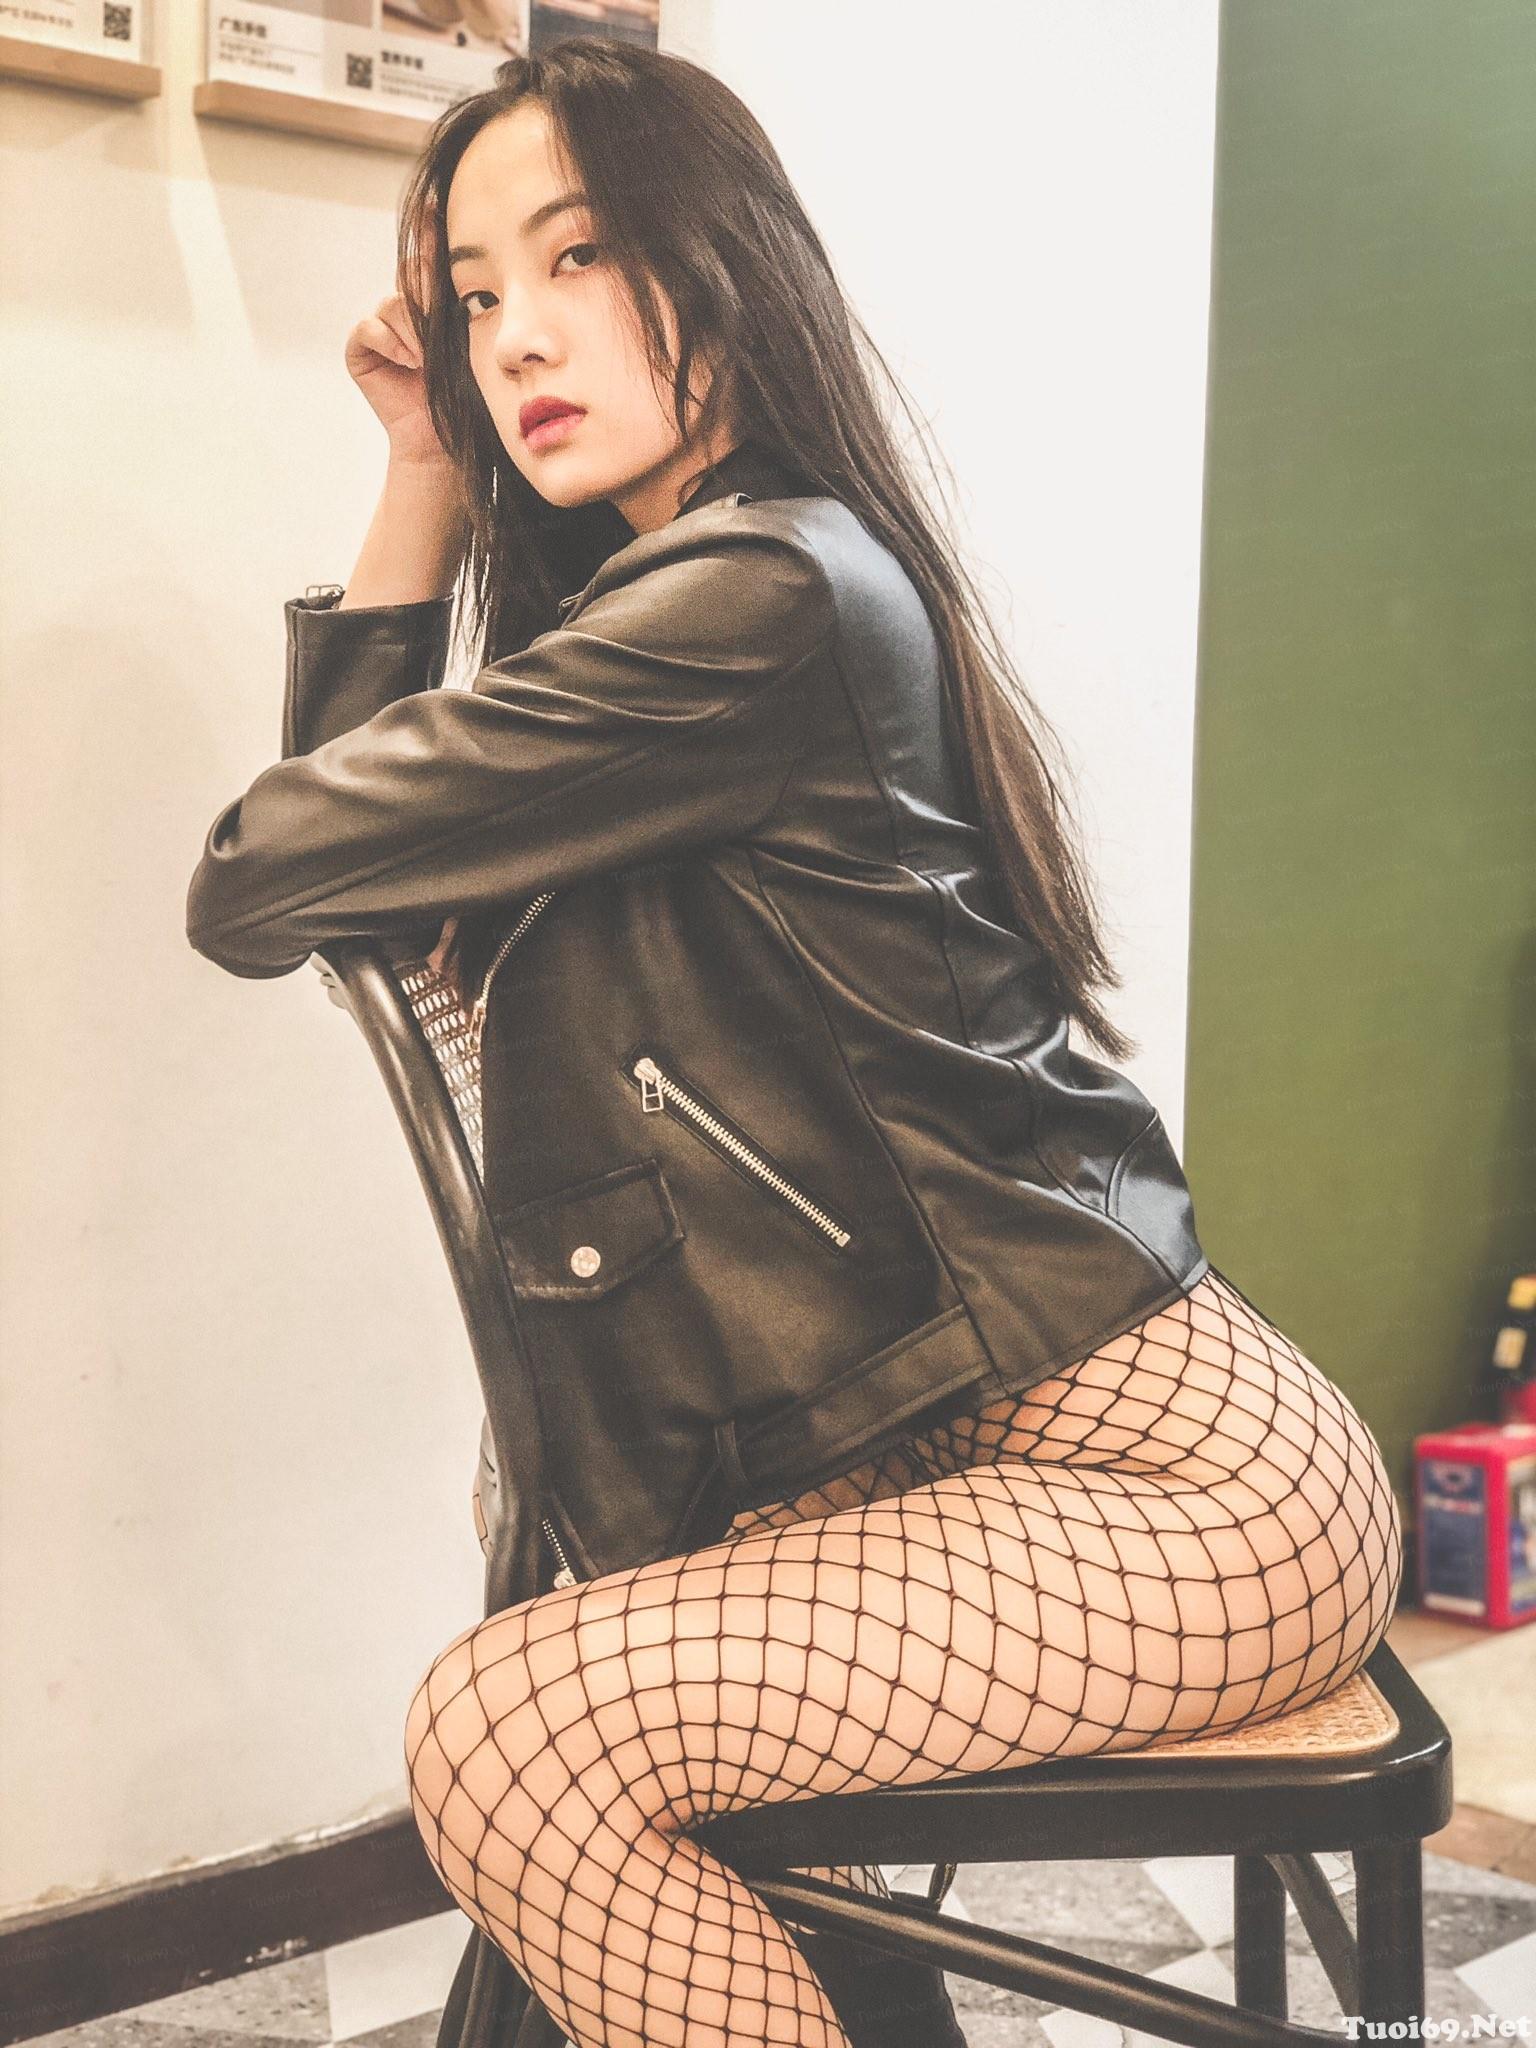 Video + Ảnh Nude kinh điển của em người mẫu Xiashuidaojun (下水道)